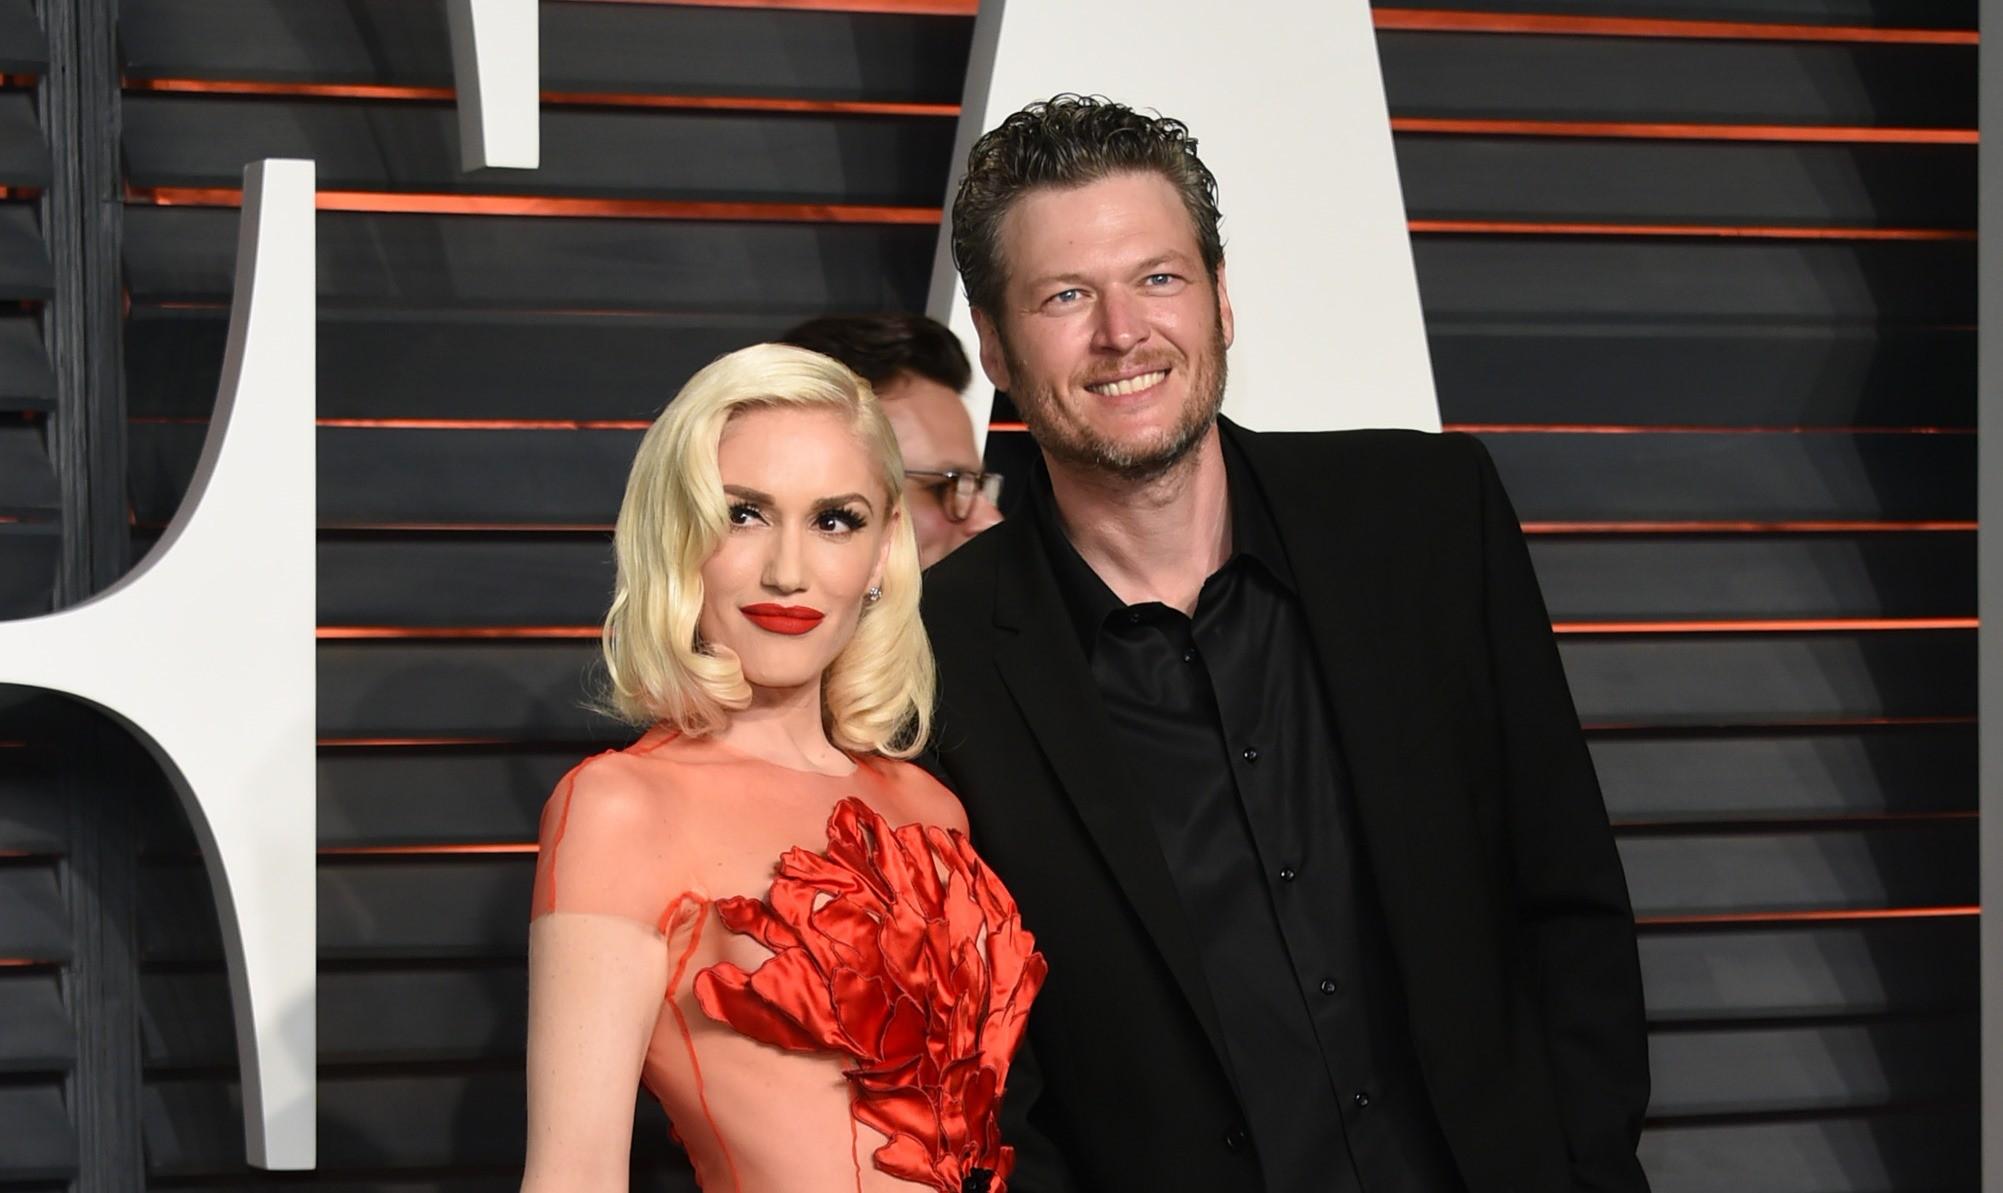 Blake Shelton e Gwen Stefani lanaram 'Go Ahead and Break My Heart' (Foto: Evan Agostini/Invision/AP)